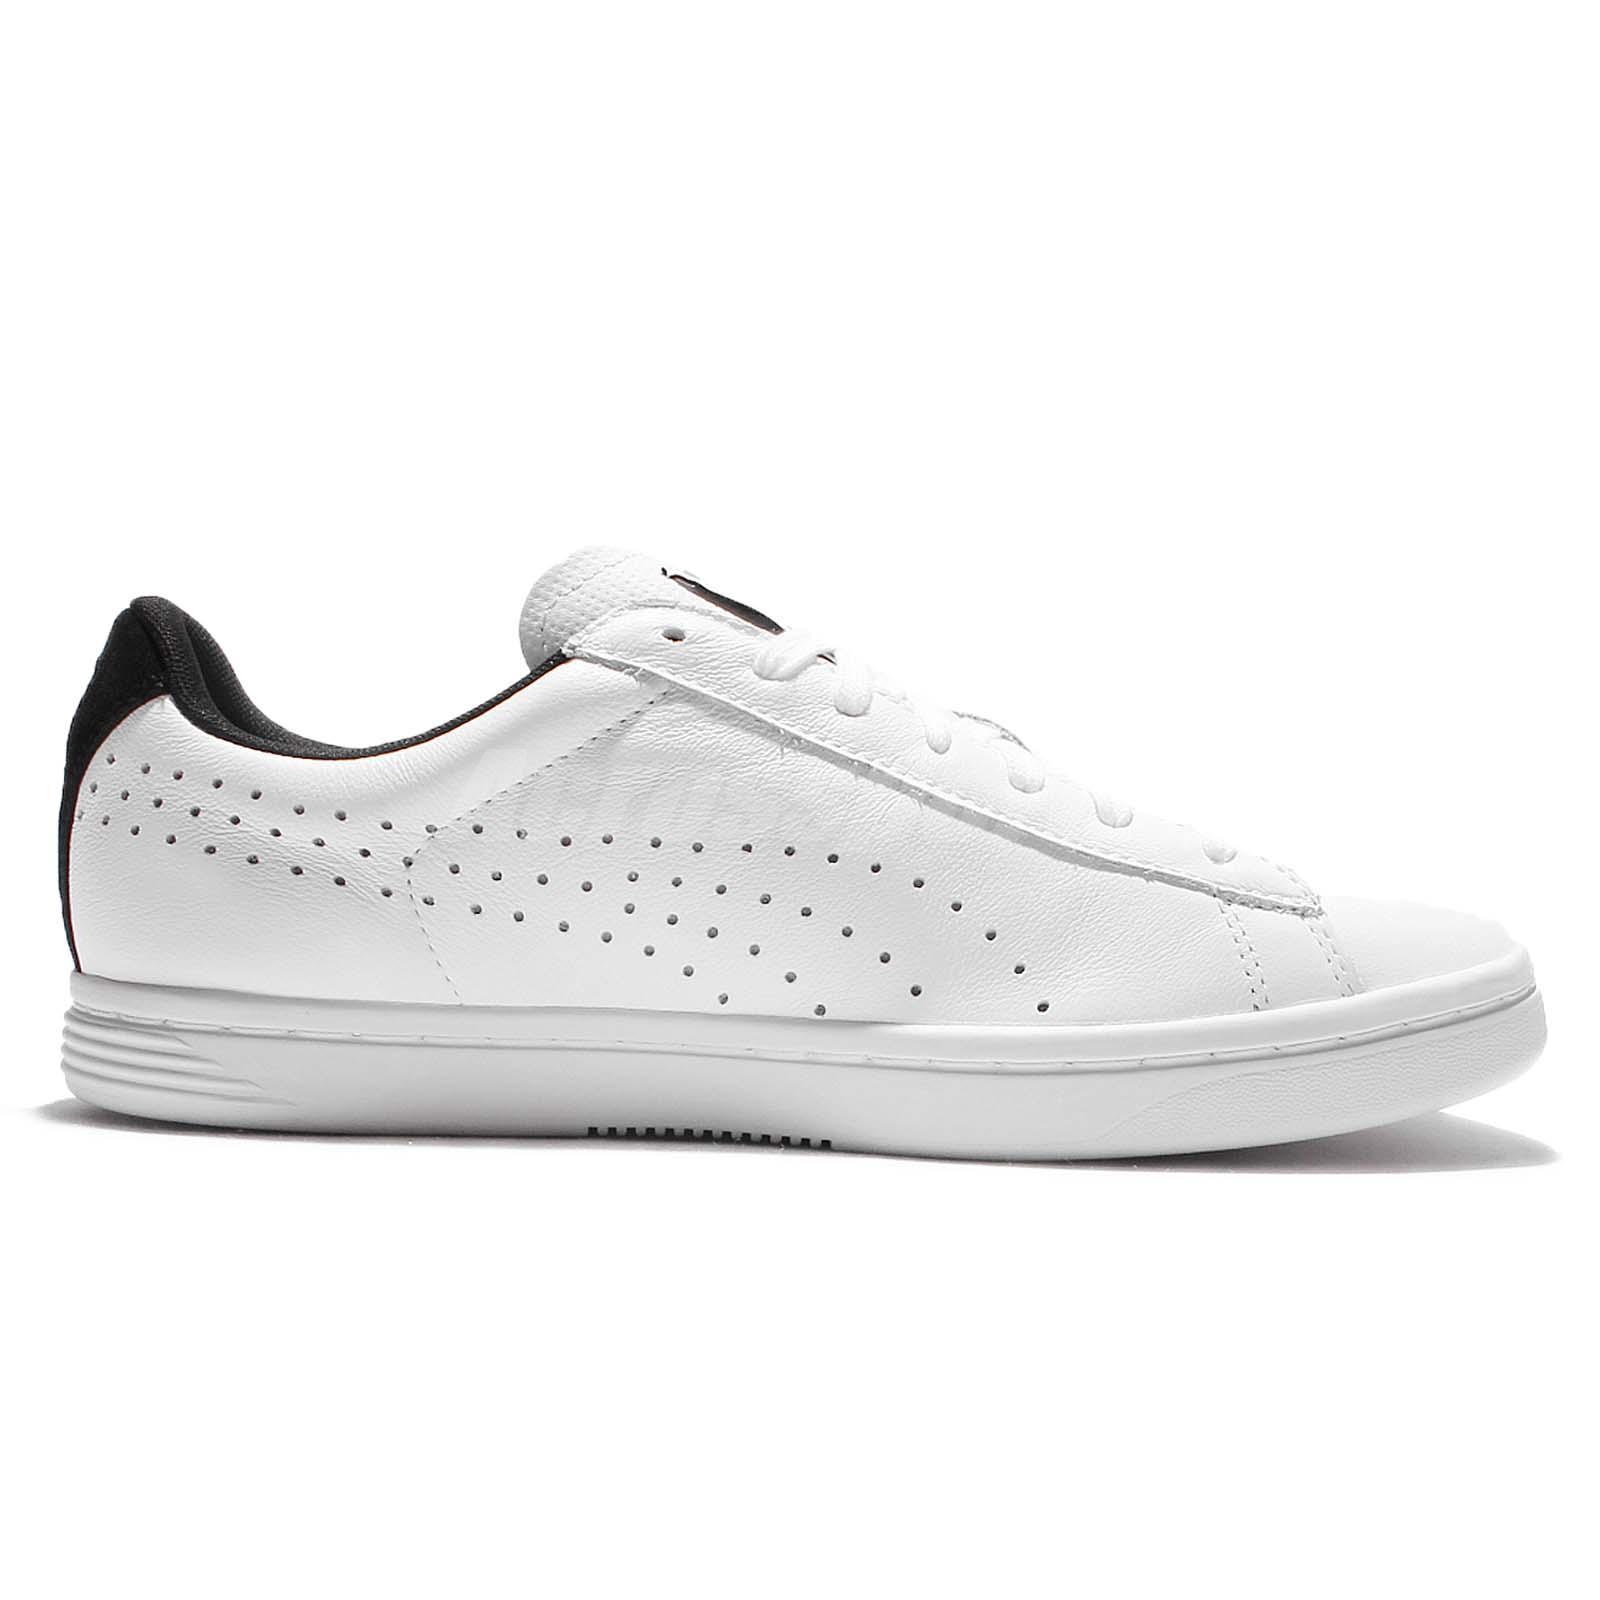 Puma Court Star CRFTD Crafted White Black Mens Training Shoes ... e2acd6354